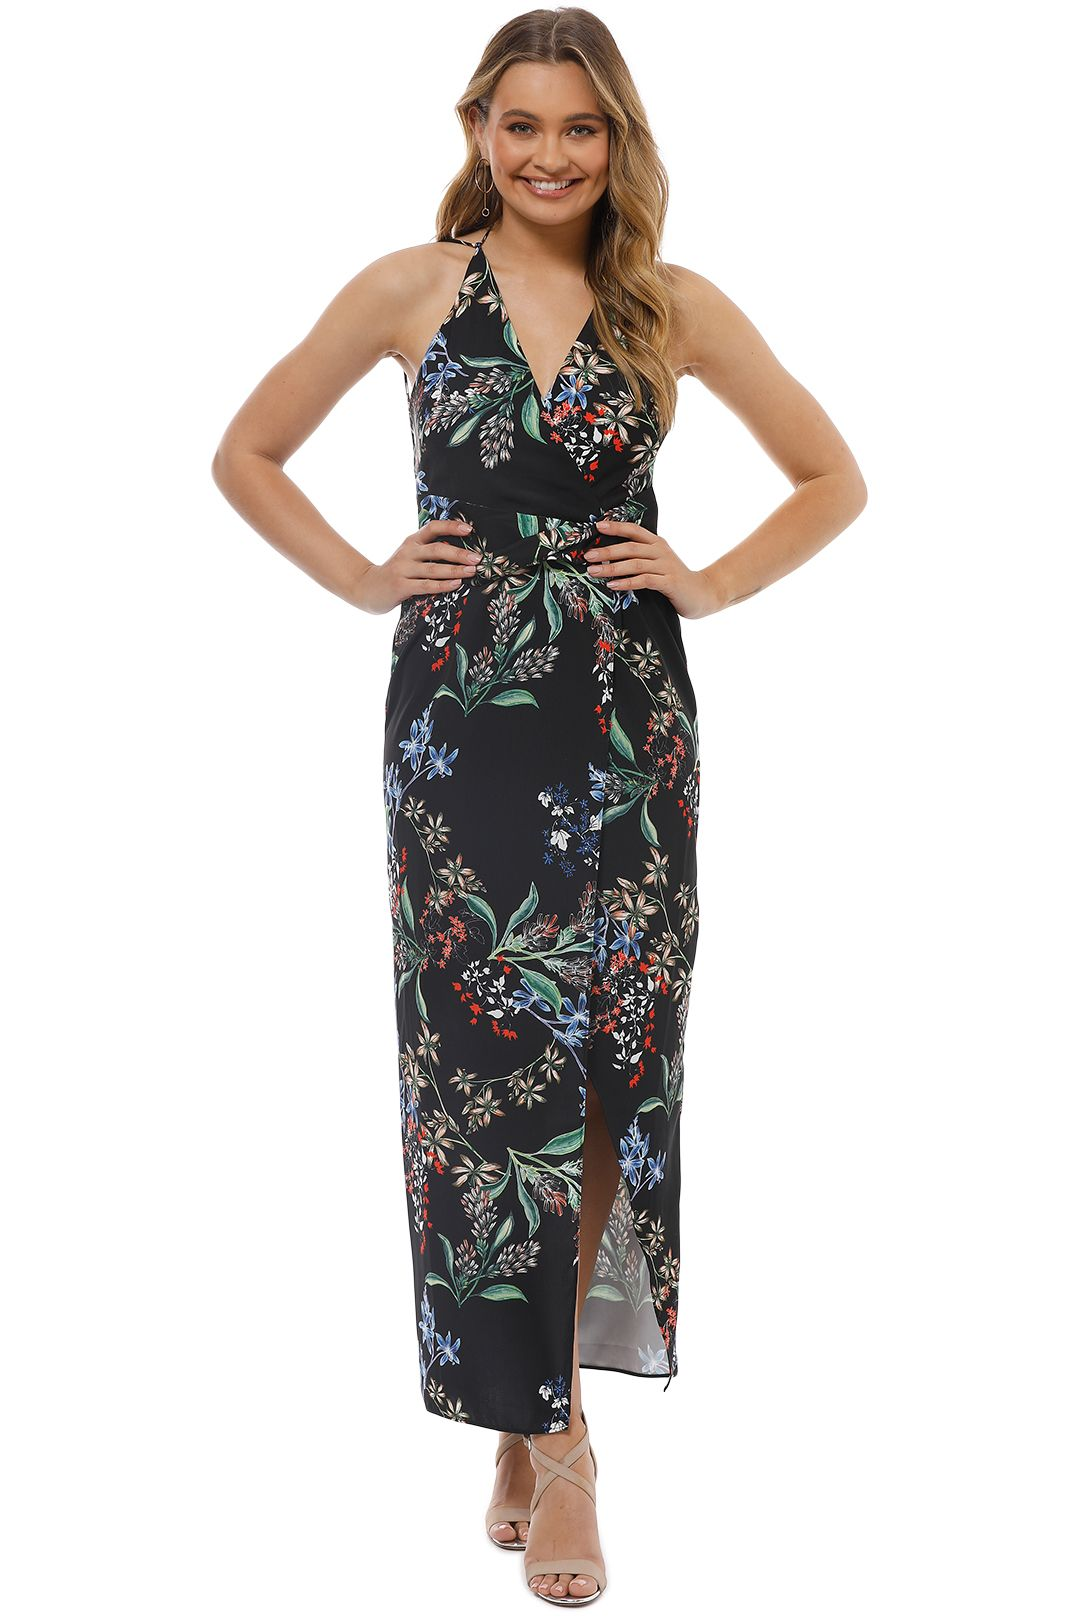 Stylestalker - Avalon Maxi Dress - Black Floral - Front